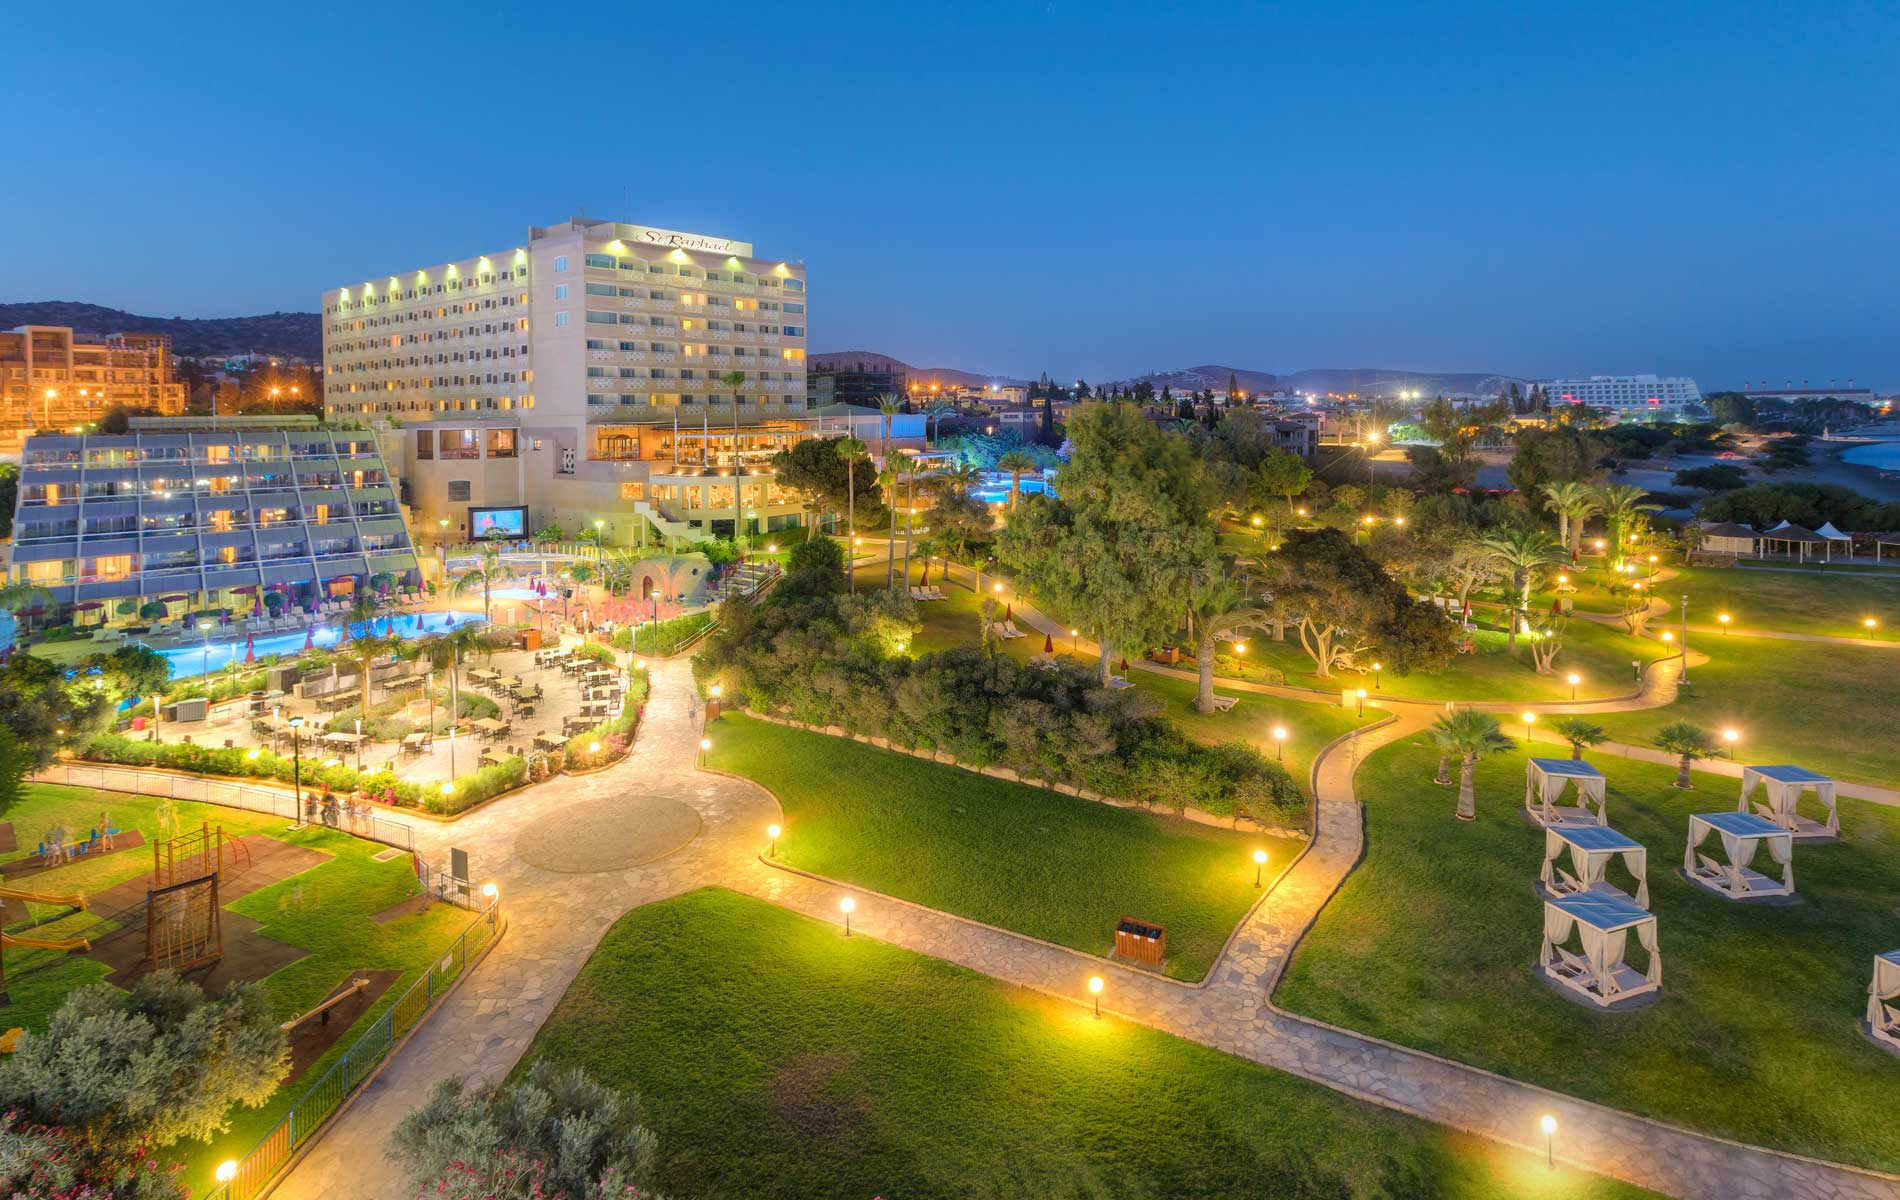 St Raphael Hotel-Jumbo Travel-overview night